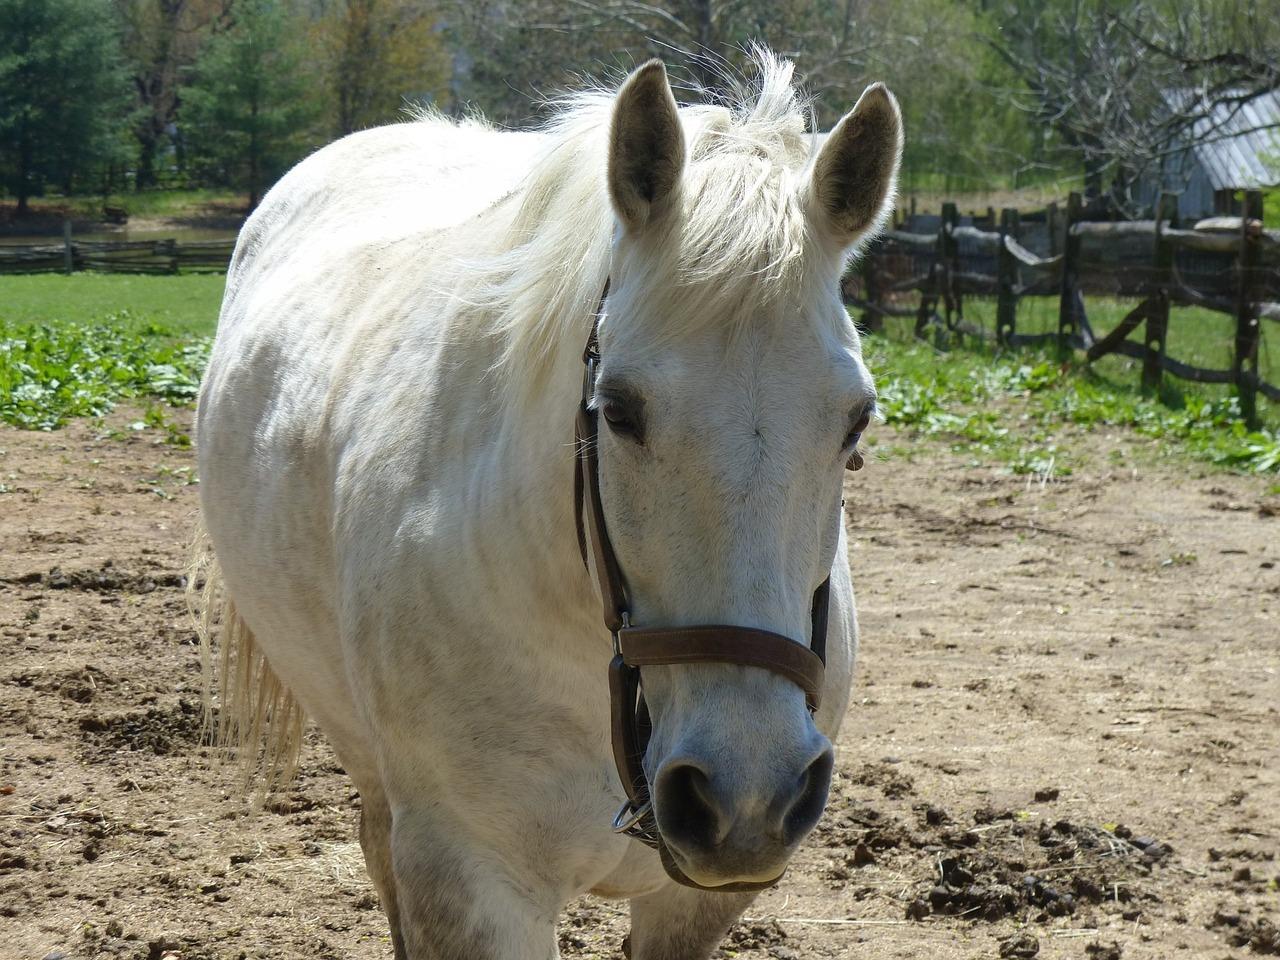 Horse Farm Animal Pet White Free Photo On Pixabay